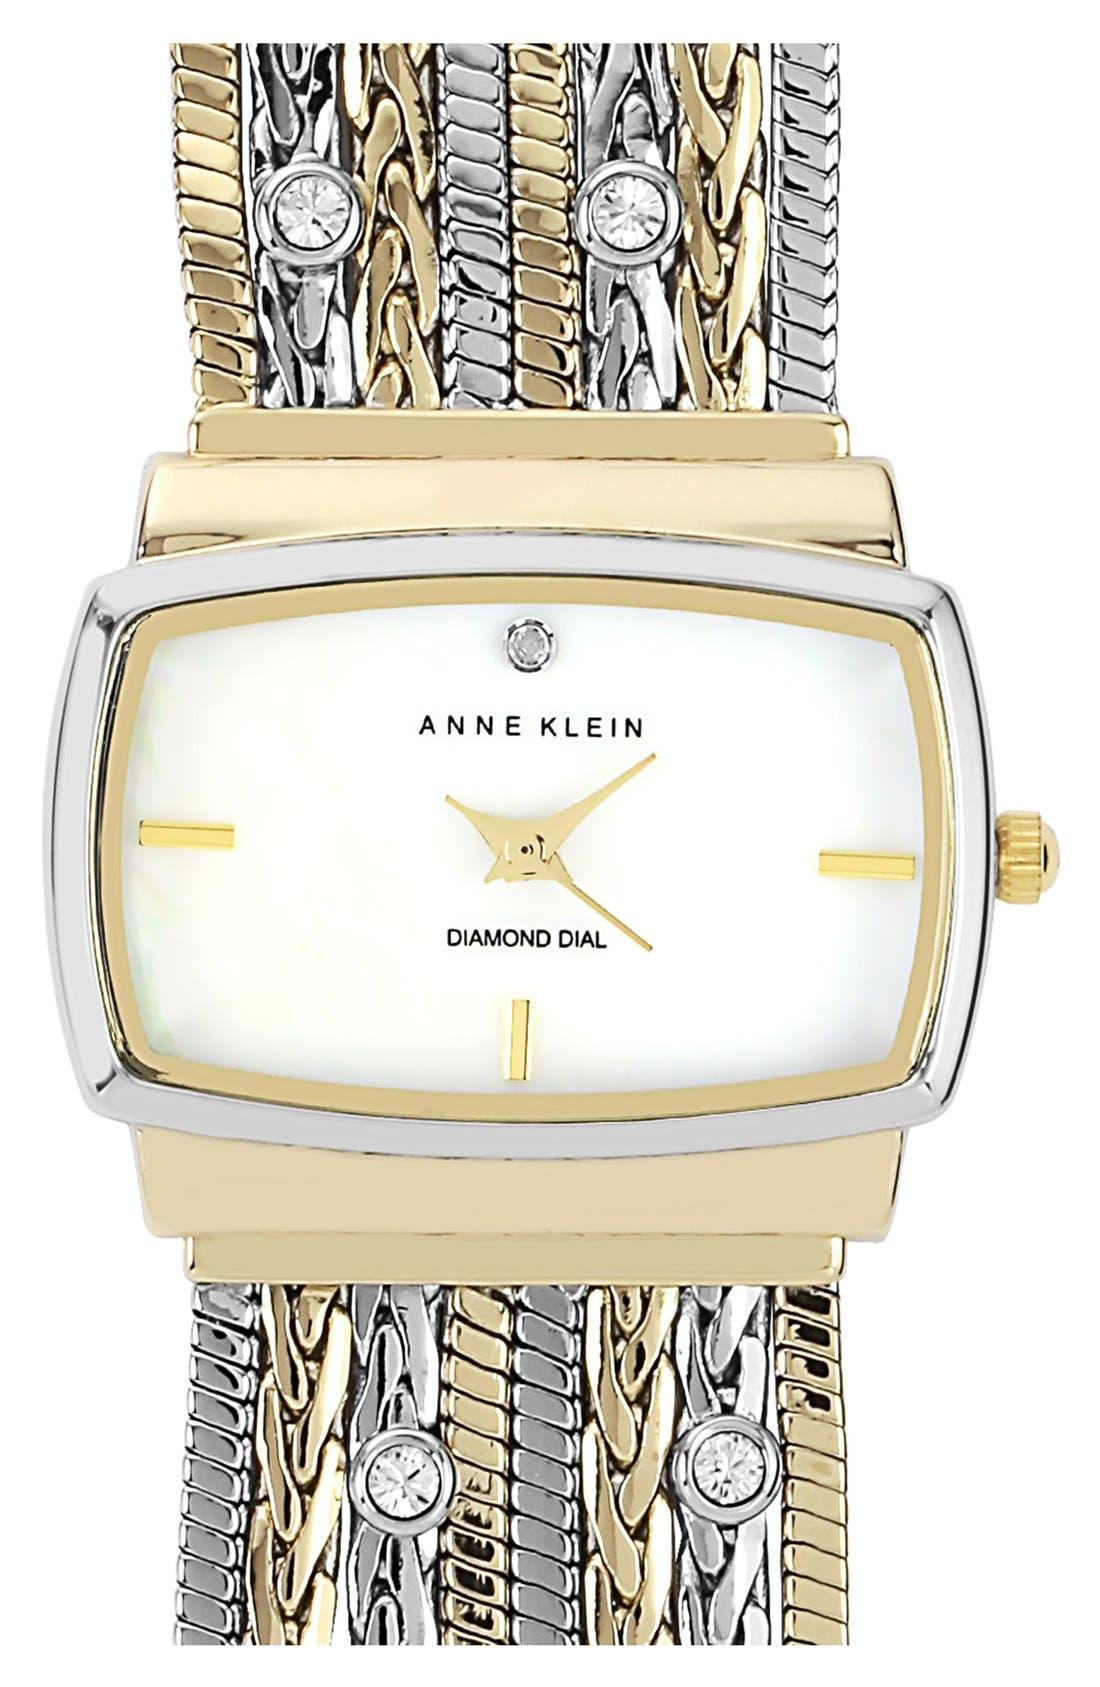 Main Image - Anne Klein Single Diamond Two Tone Bracelet Watch, 25mm x 19mm